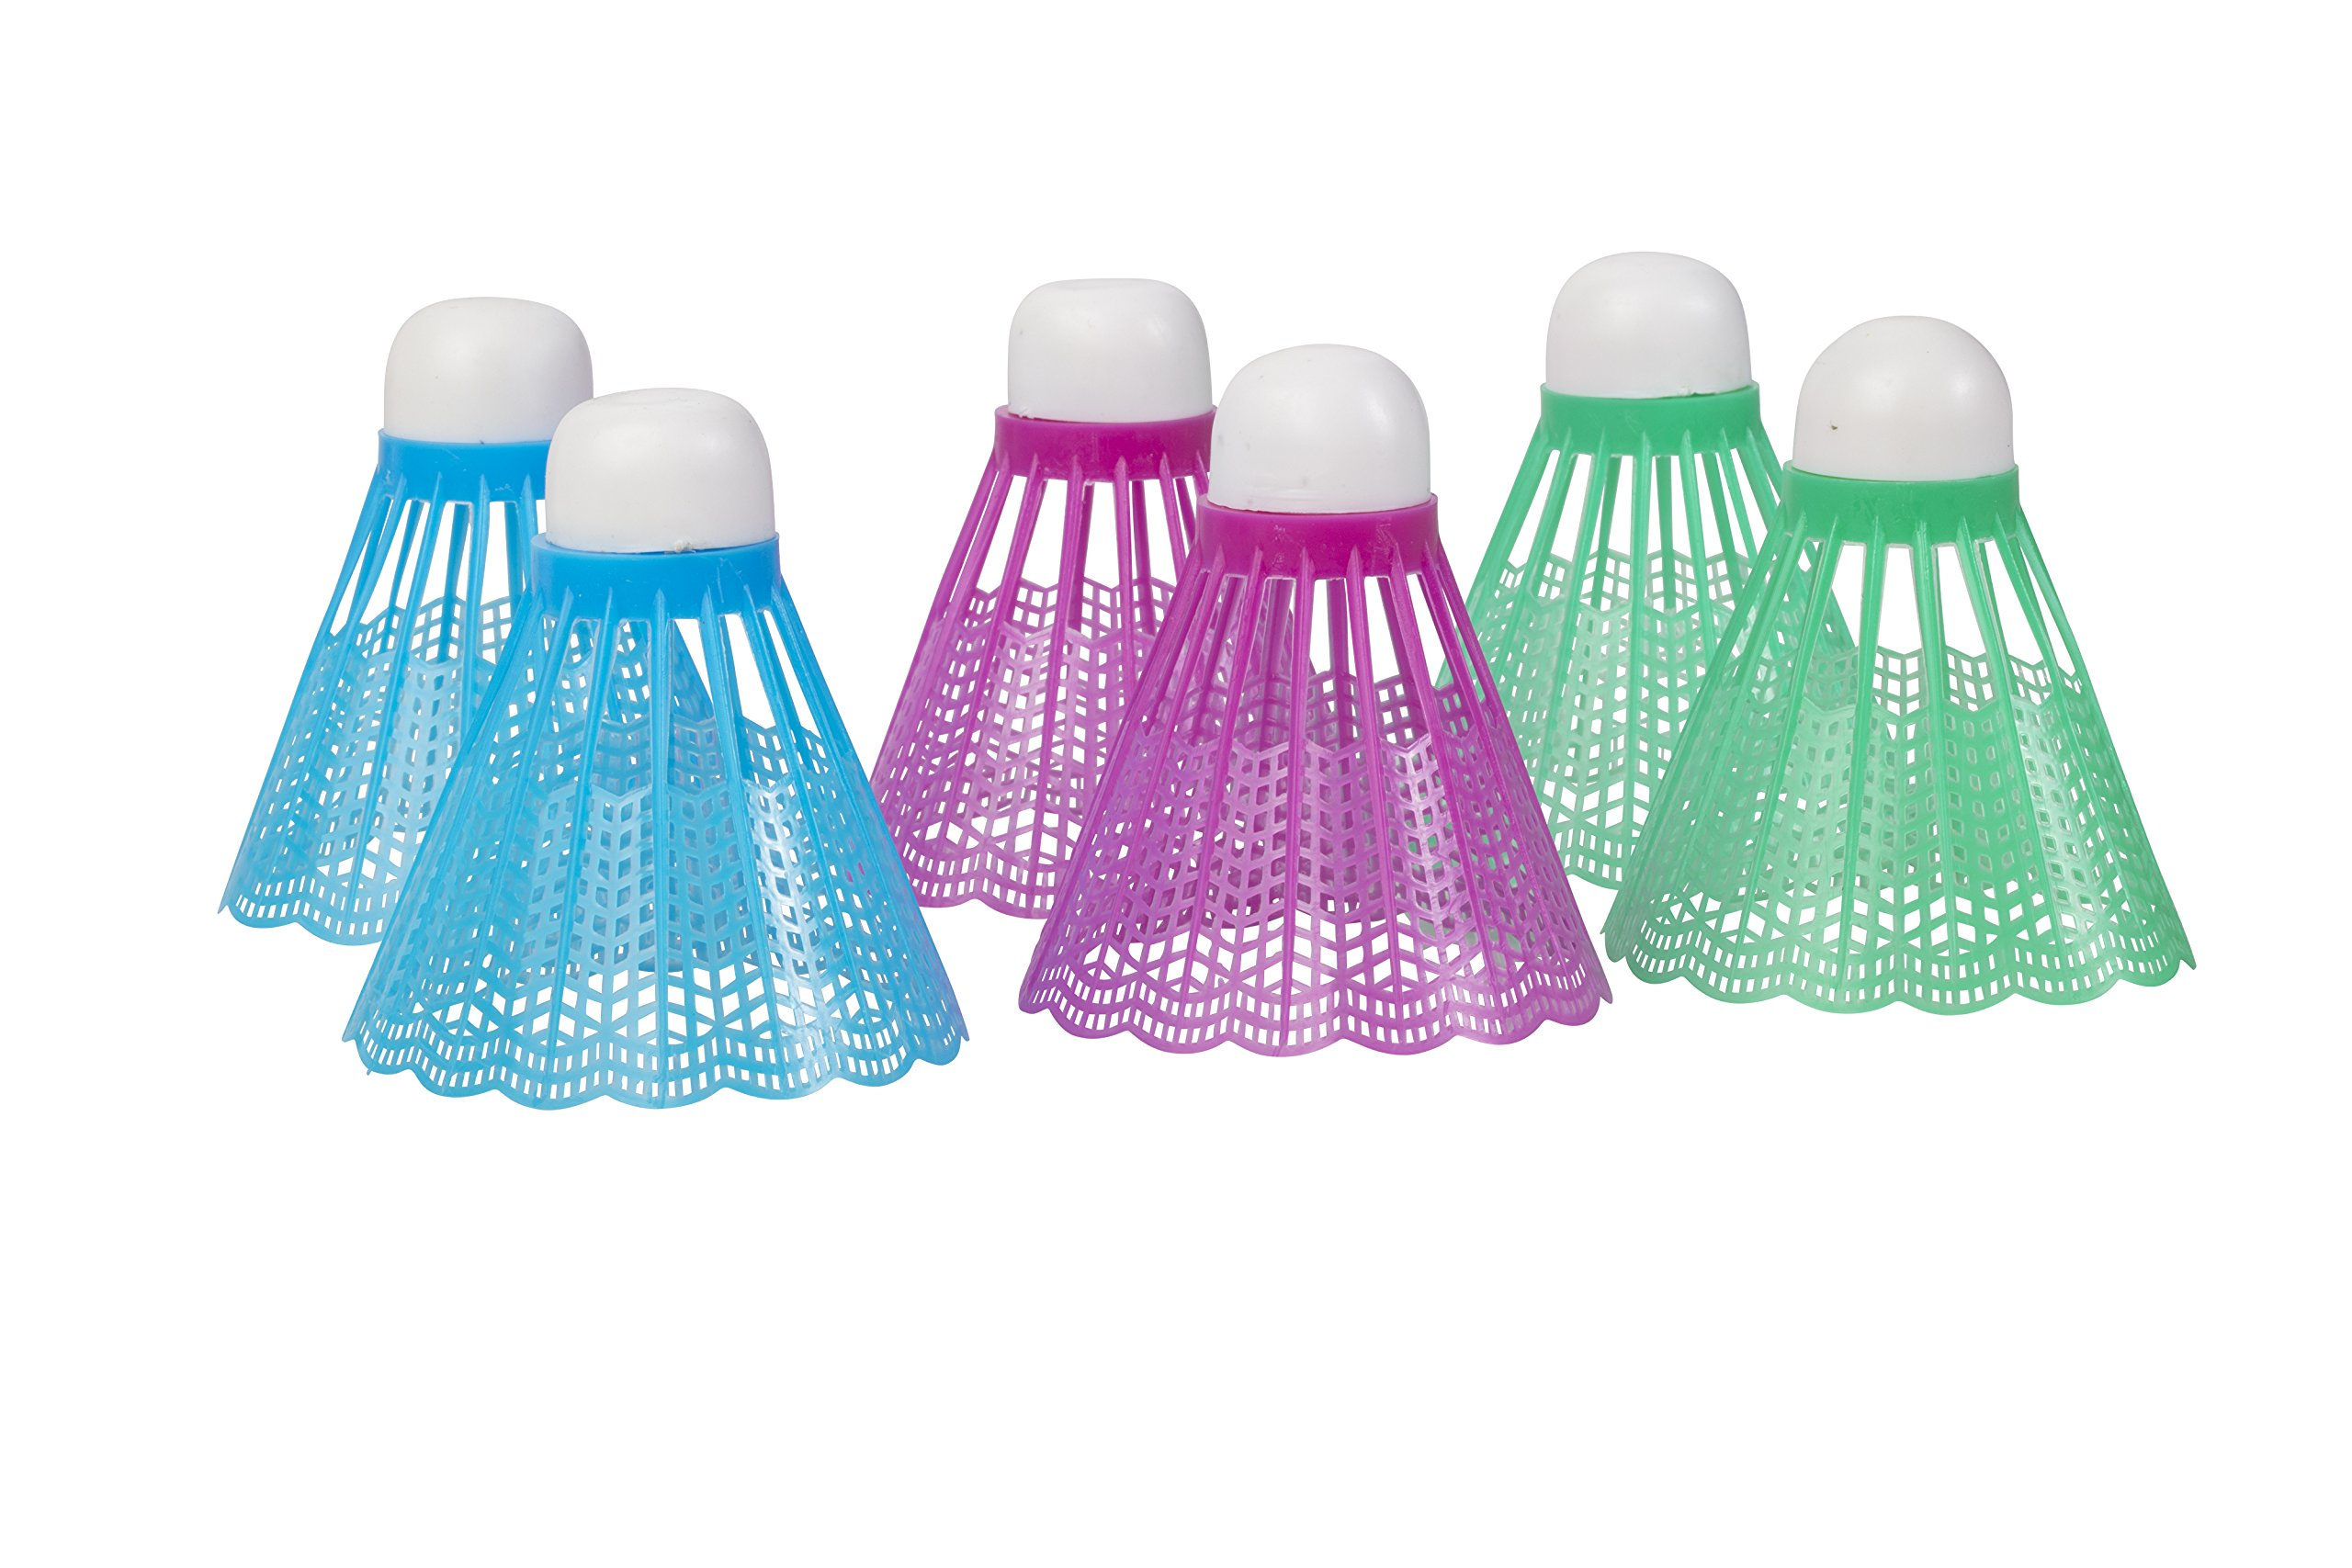 Triumph Replacement Badminton Shuttlecocks (6-Pack, White)